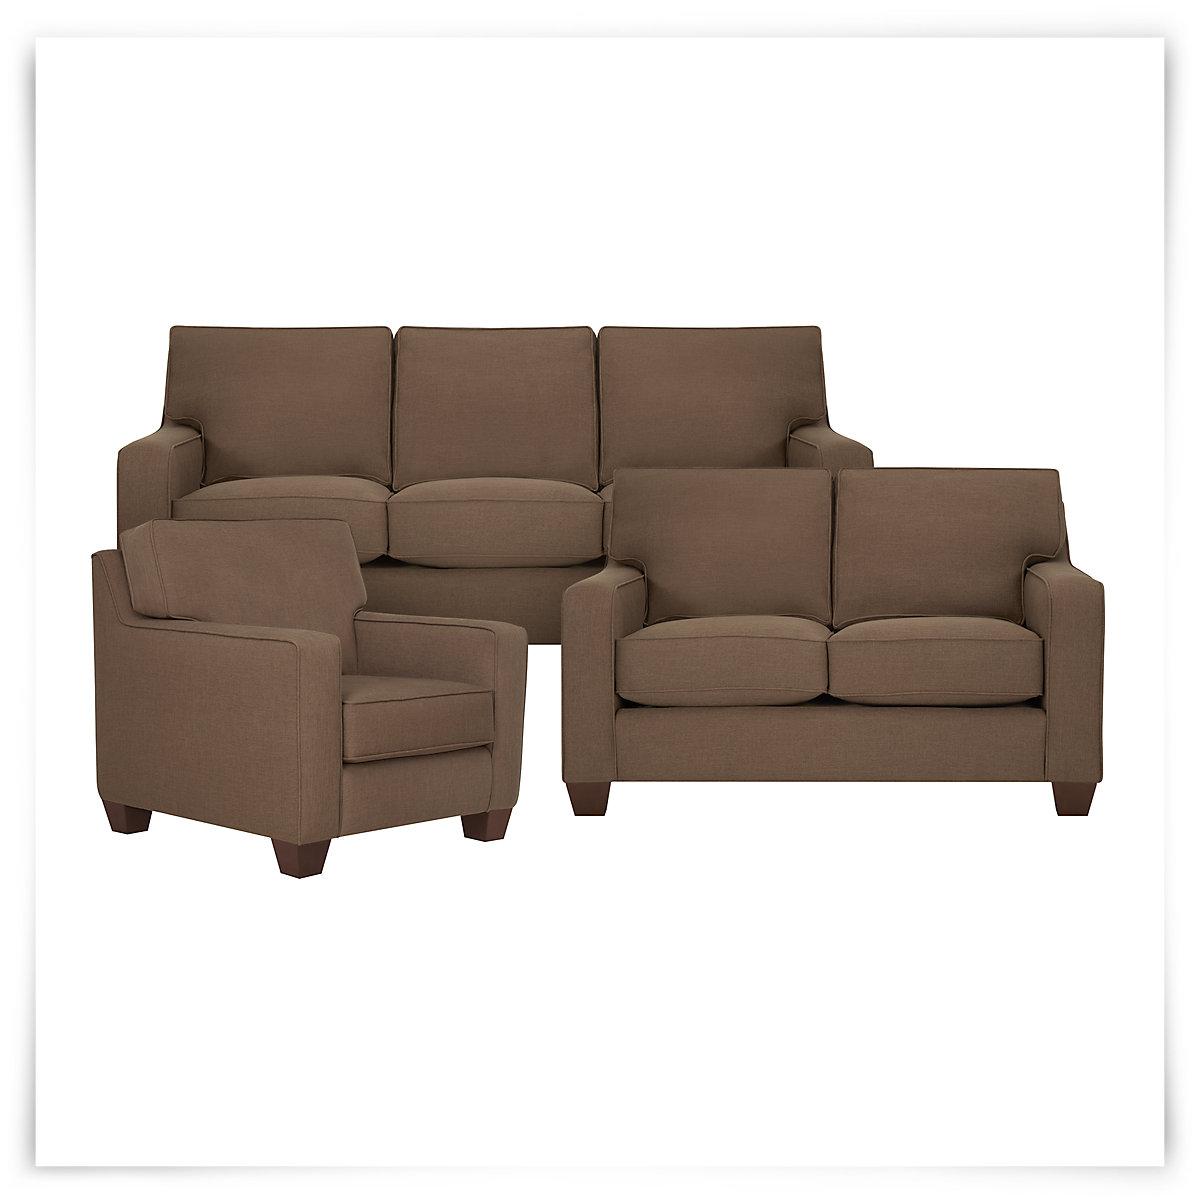 City Furniture York Dk Brown Fabric Loveseat